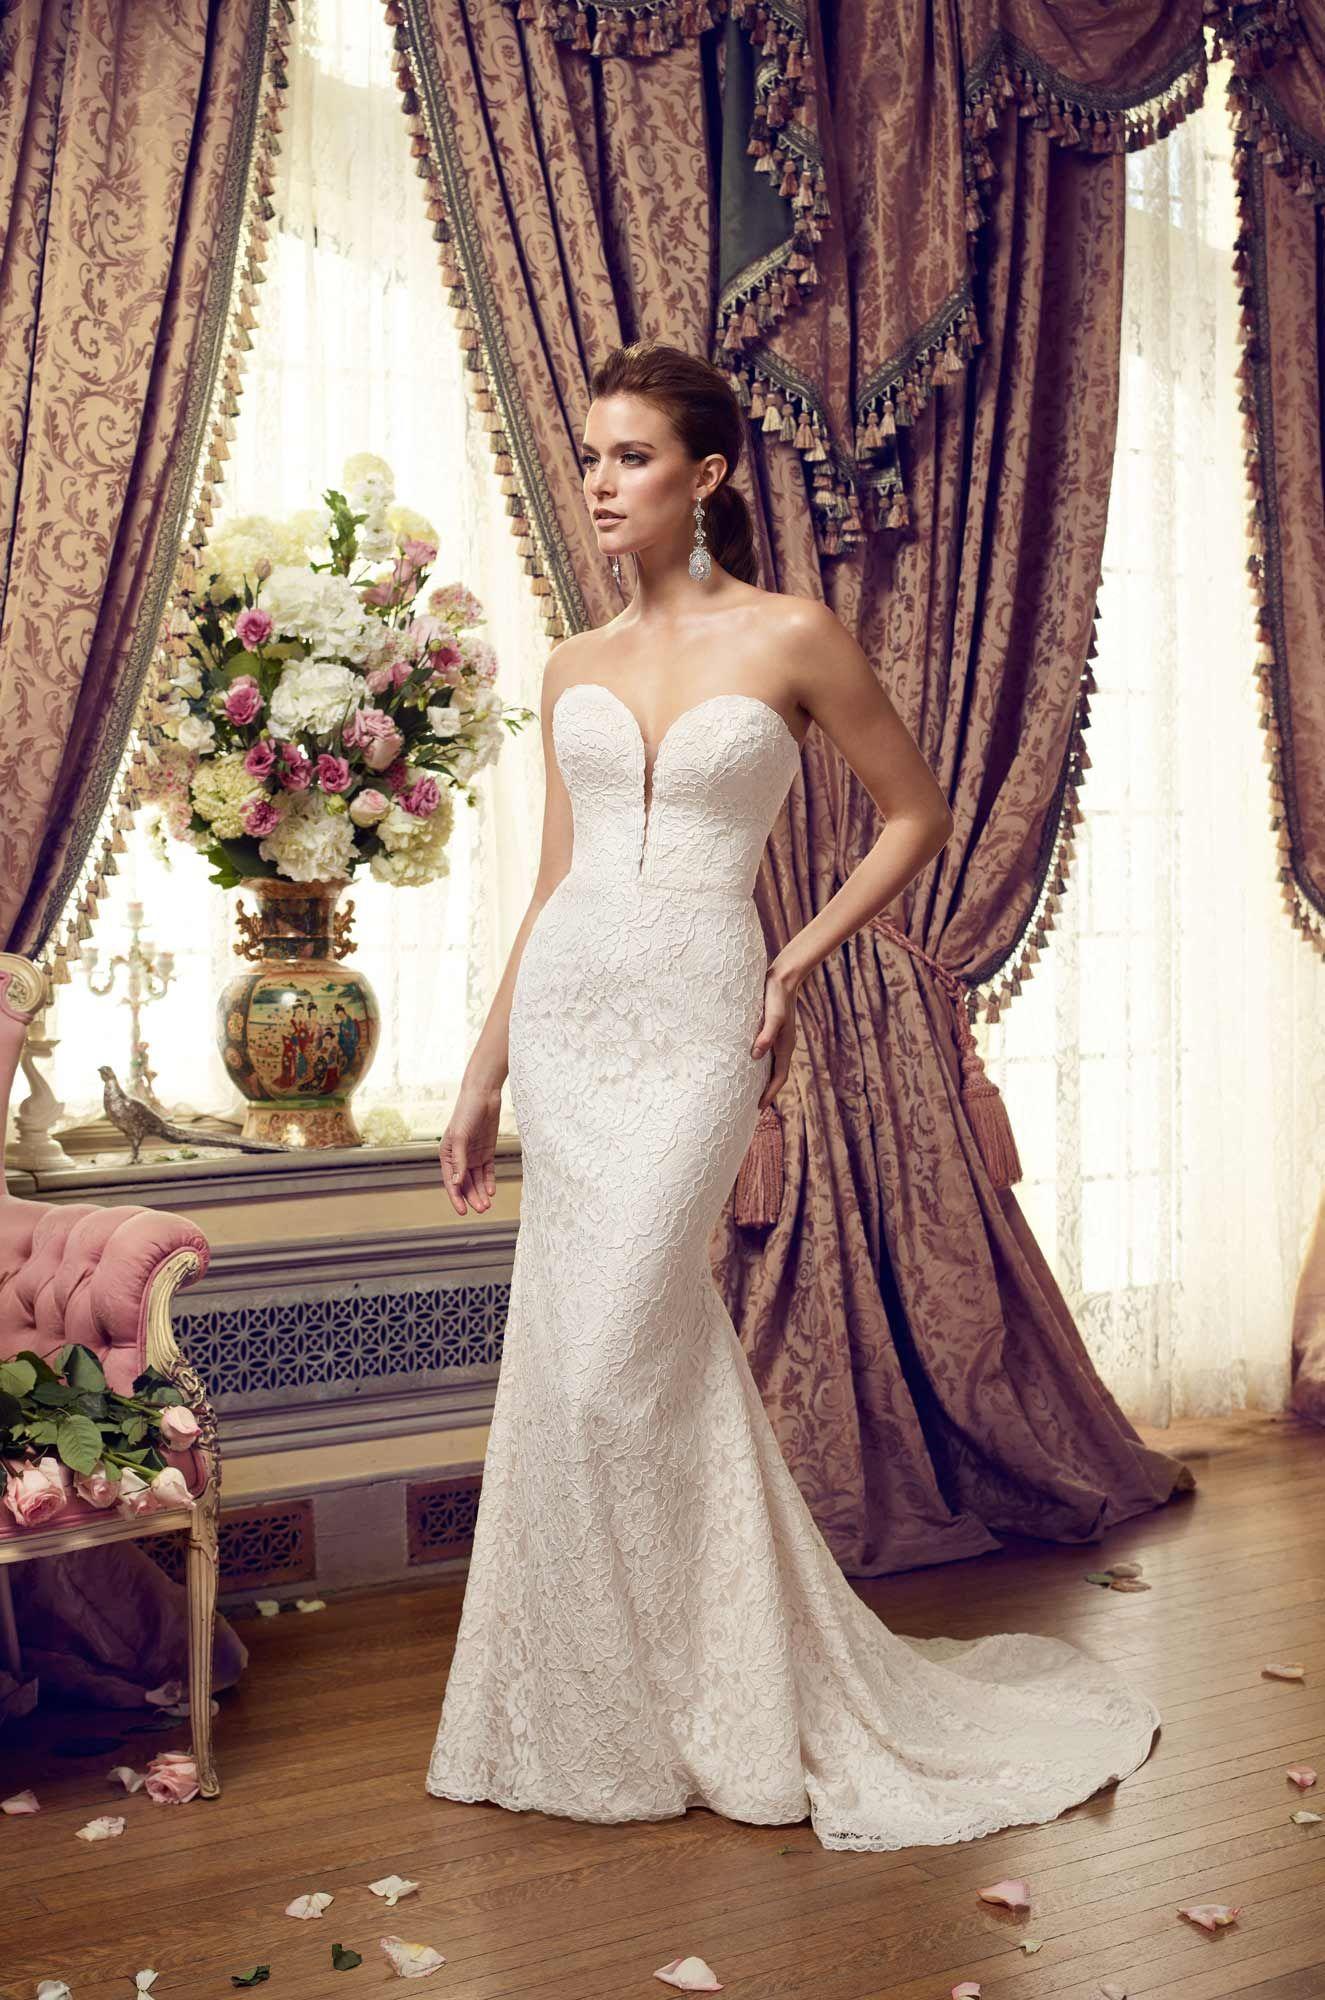 Plus size wedding dress designers  Ethereal Skirt Wedding Dress  Style   BSB Wedding Gowns